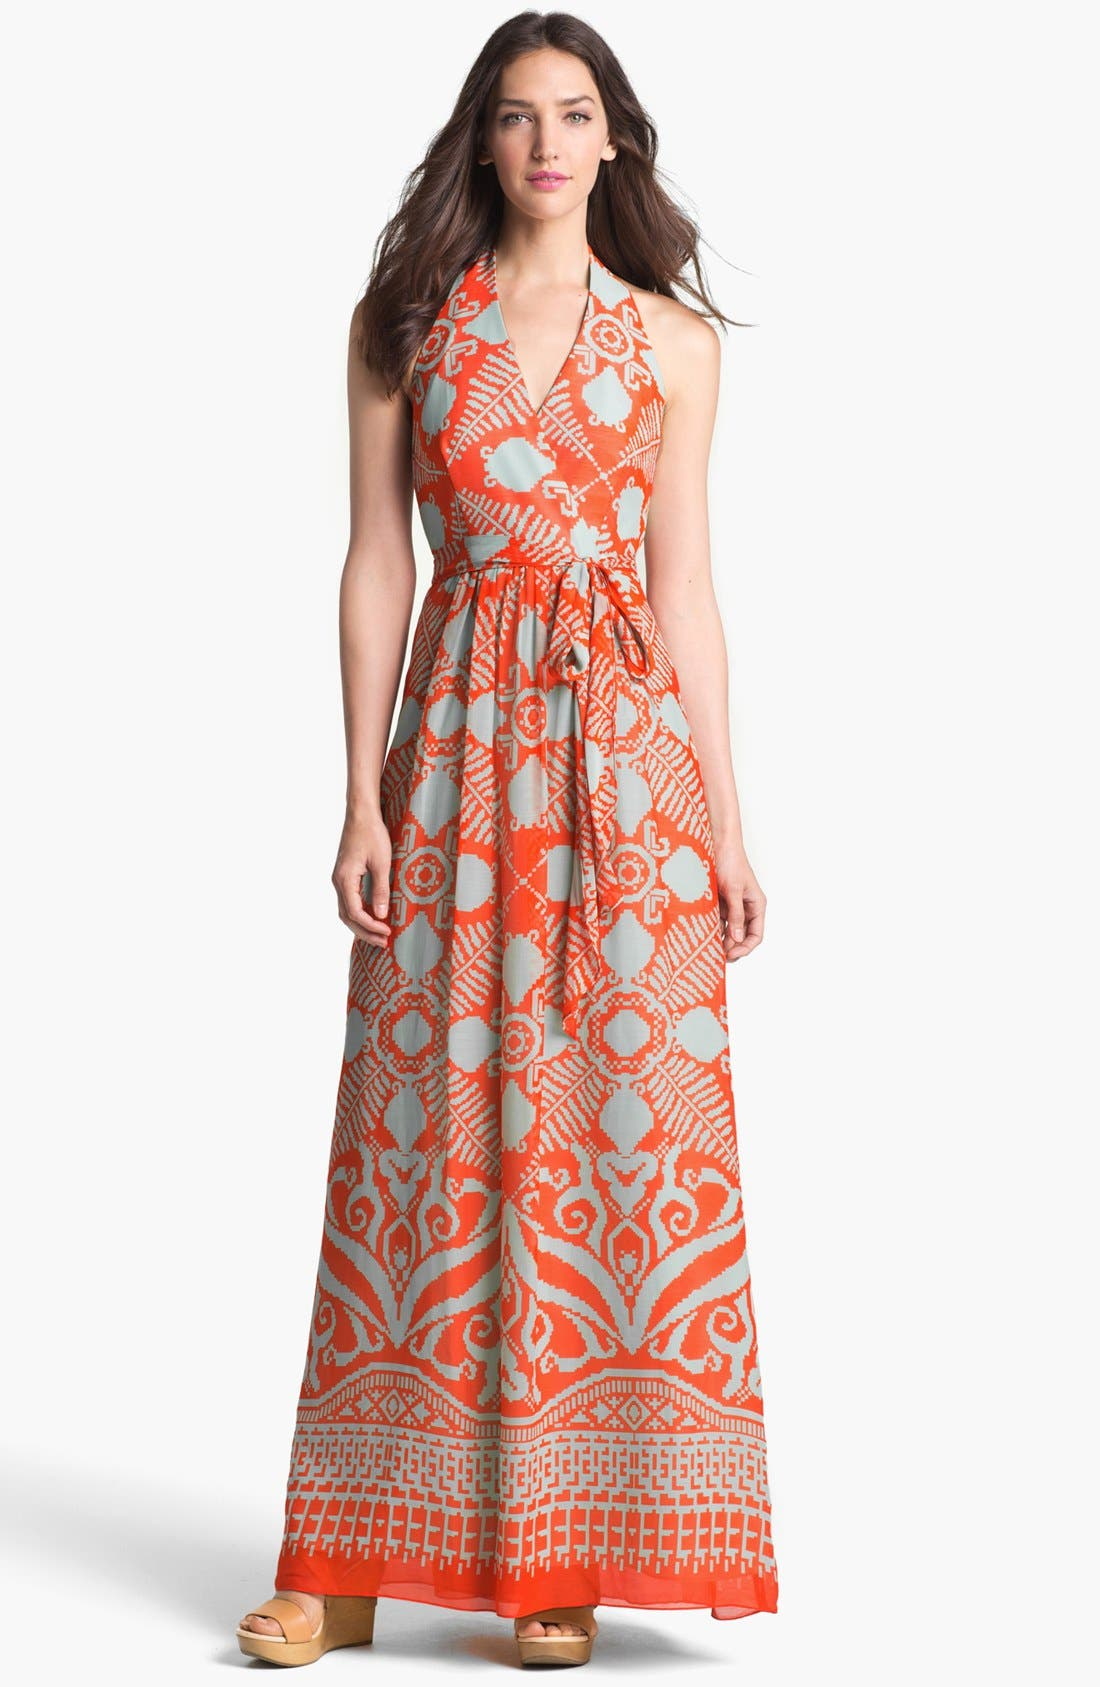 Alternate Image 1 Selected - Milly 'Gustavia' Cotton & Silk Halter Dress